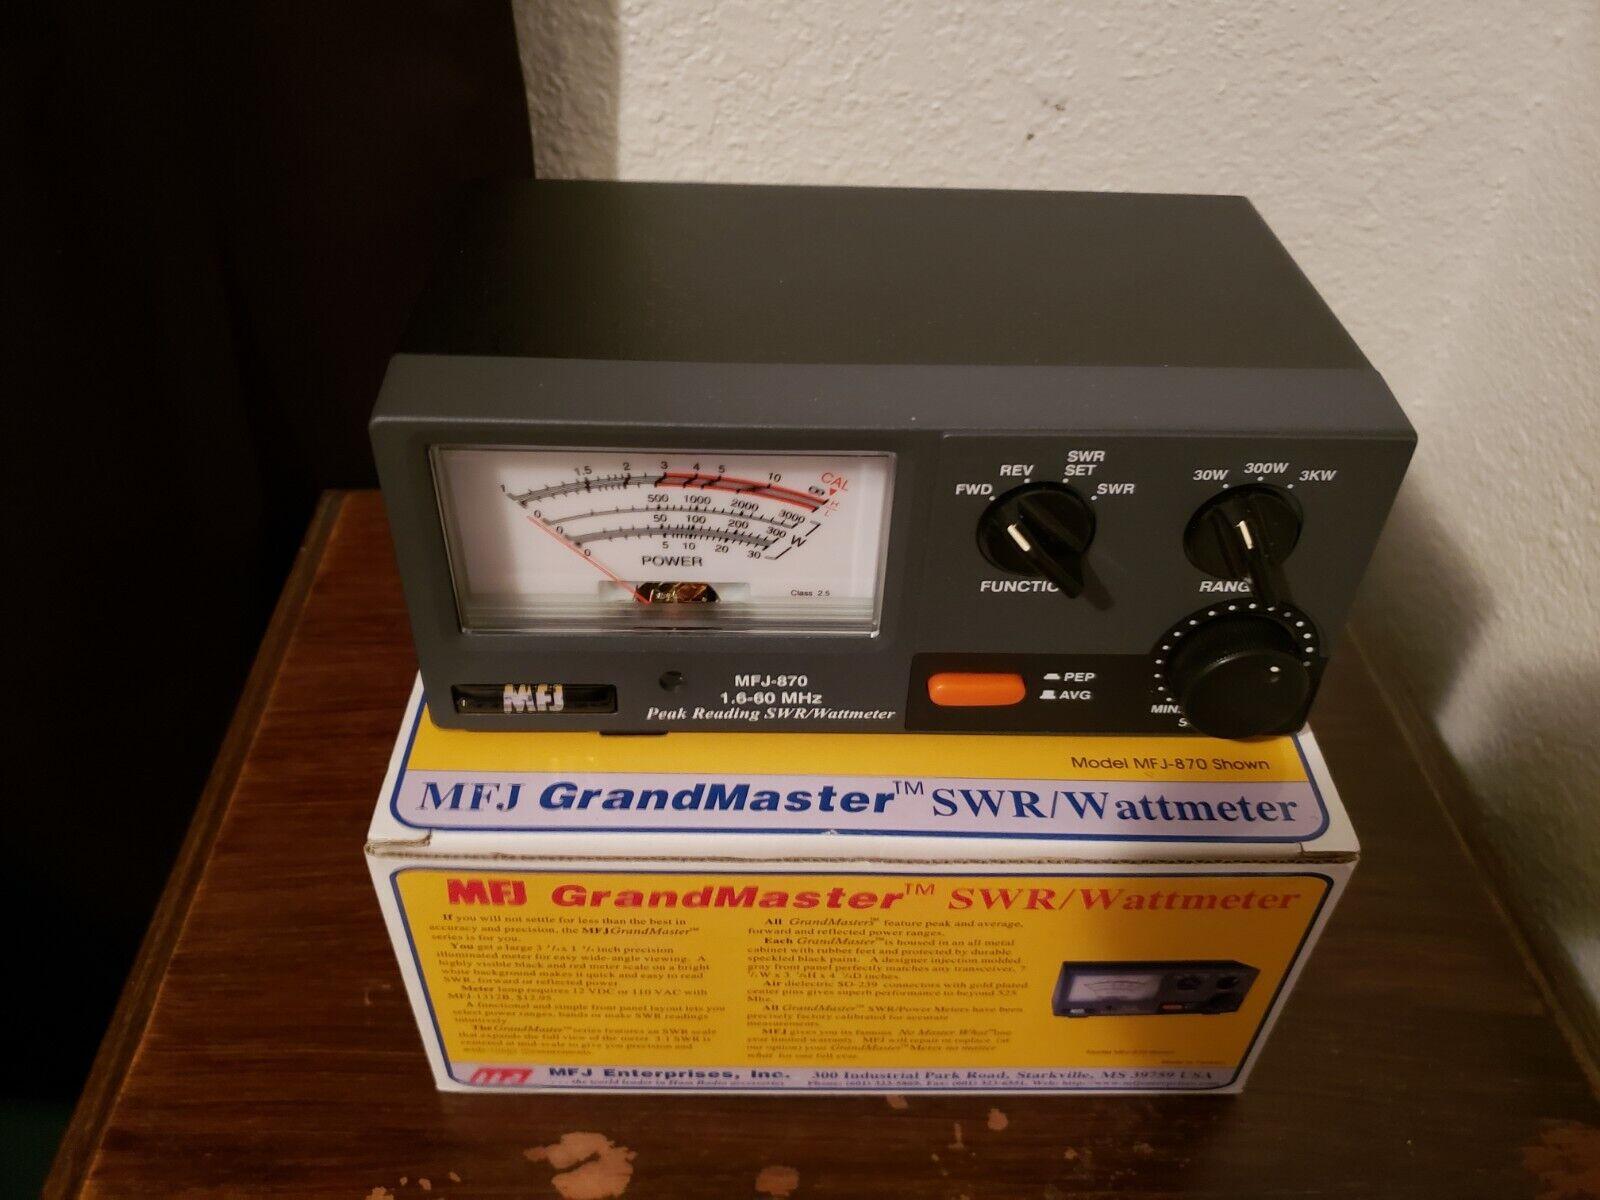 MFJ-870 Grandmaster SWR Watt meter 1.8-60MHz, 30/300/3000W.. Available Now for 95.50